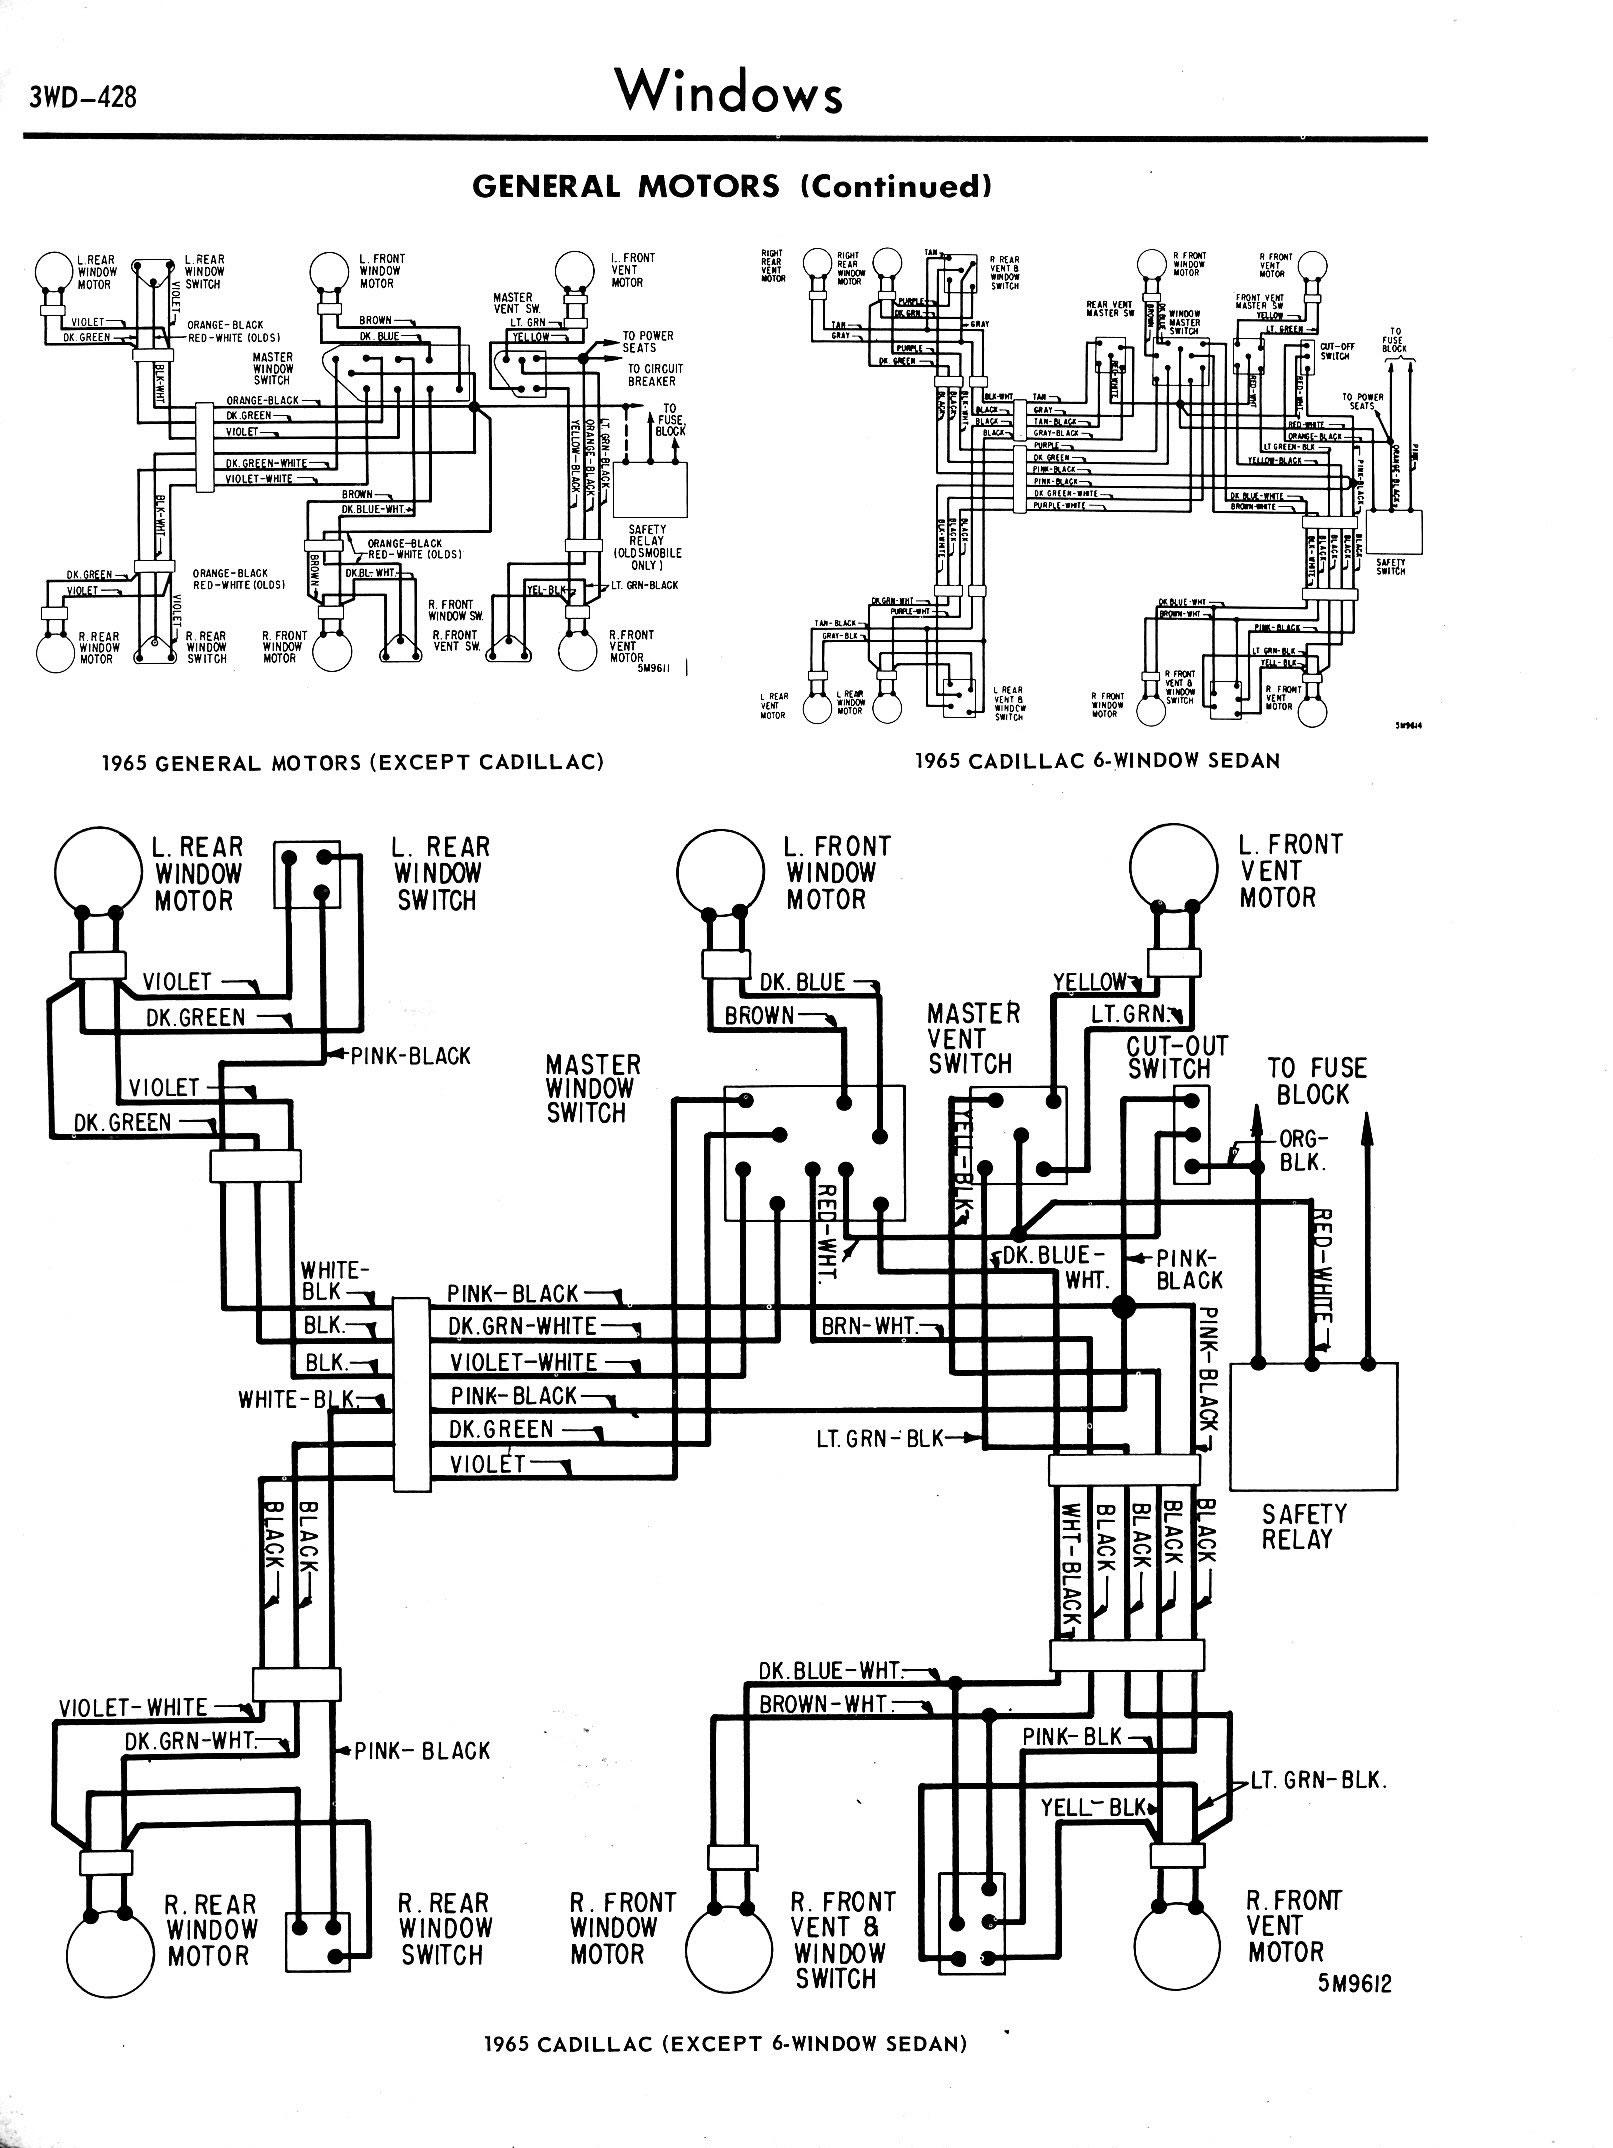 1969 Cadillac Deville Wiring Diagram Trusted Schematics 02 Transmission 2002